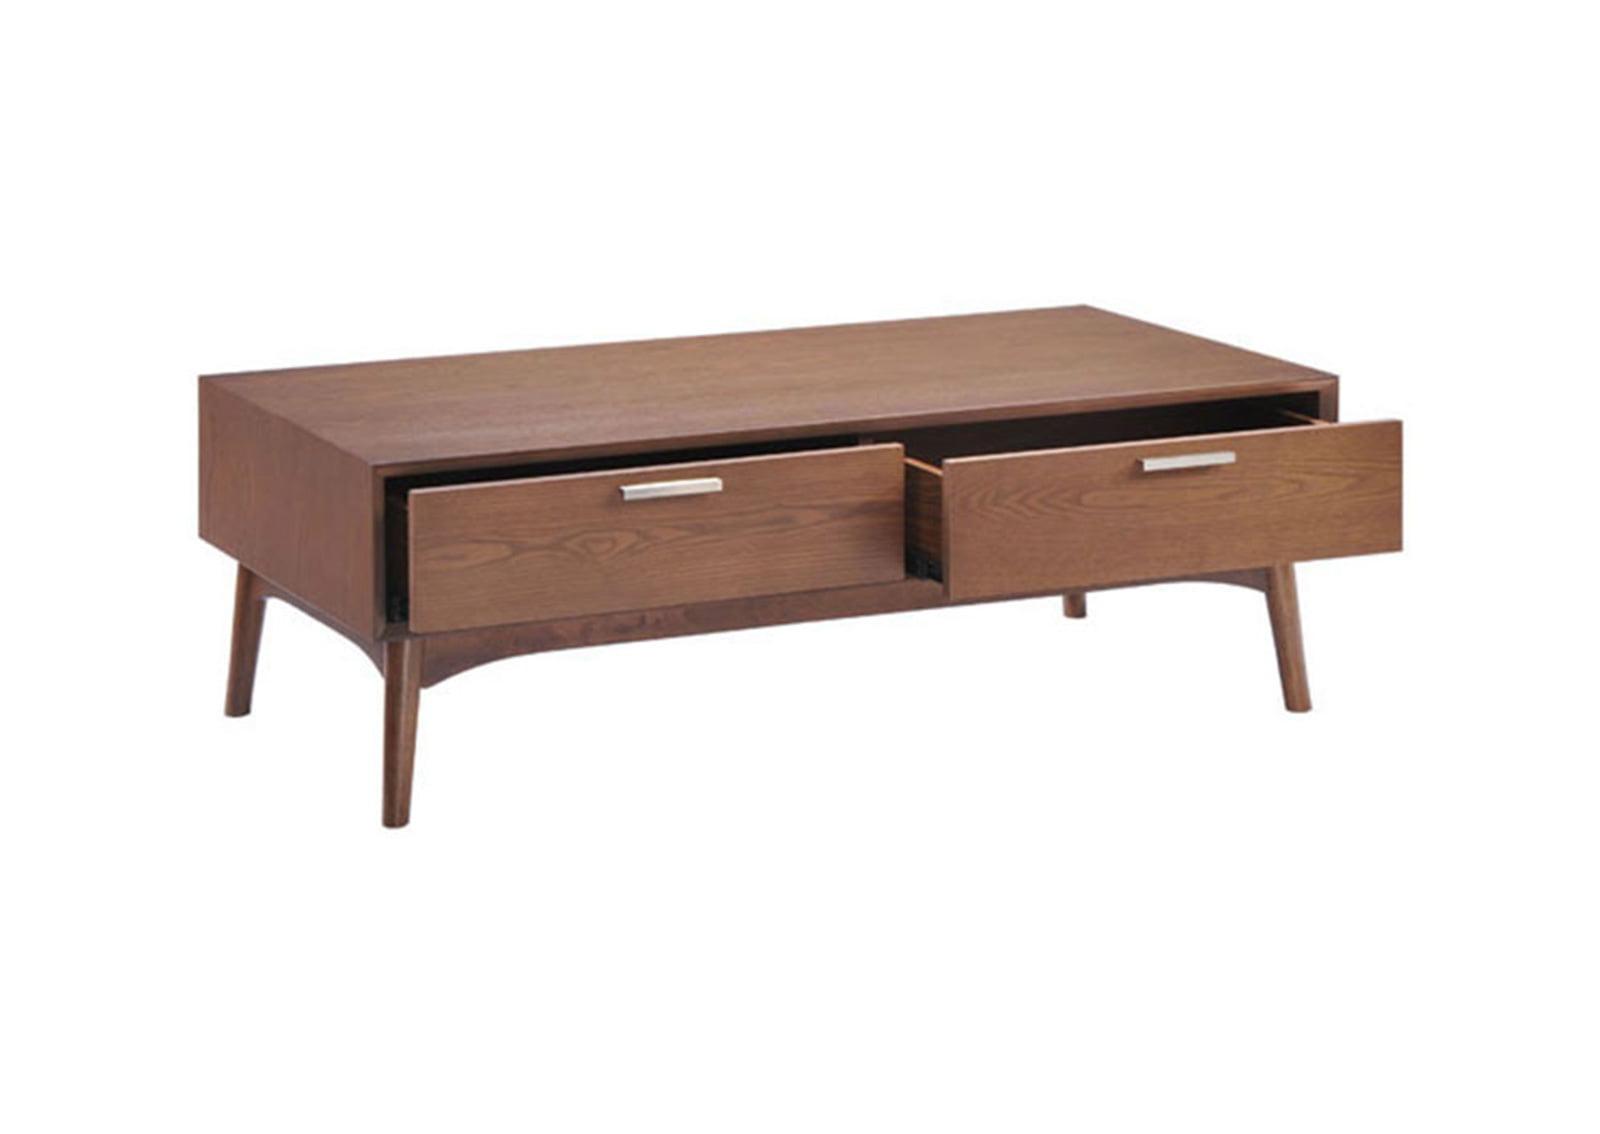 Design District Coffee Table Walnut Furnishplus